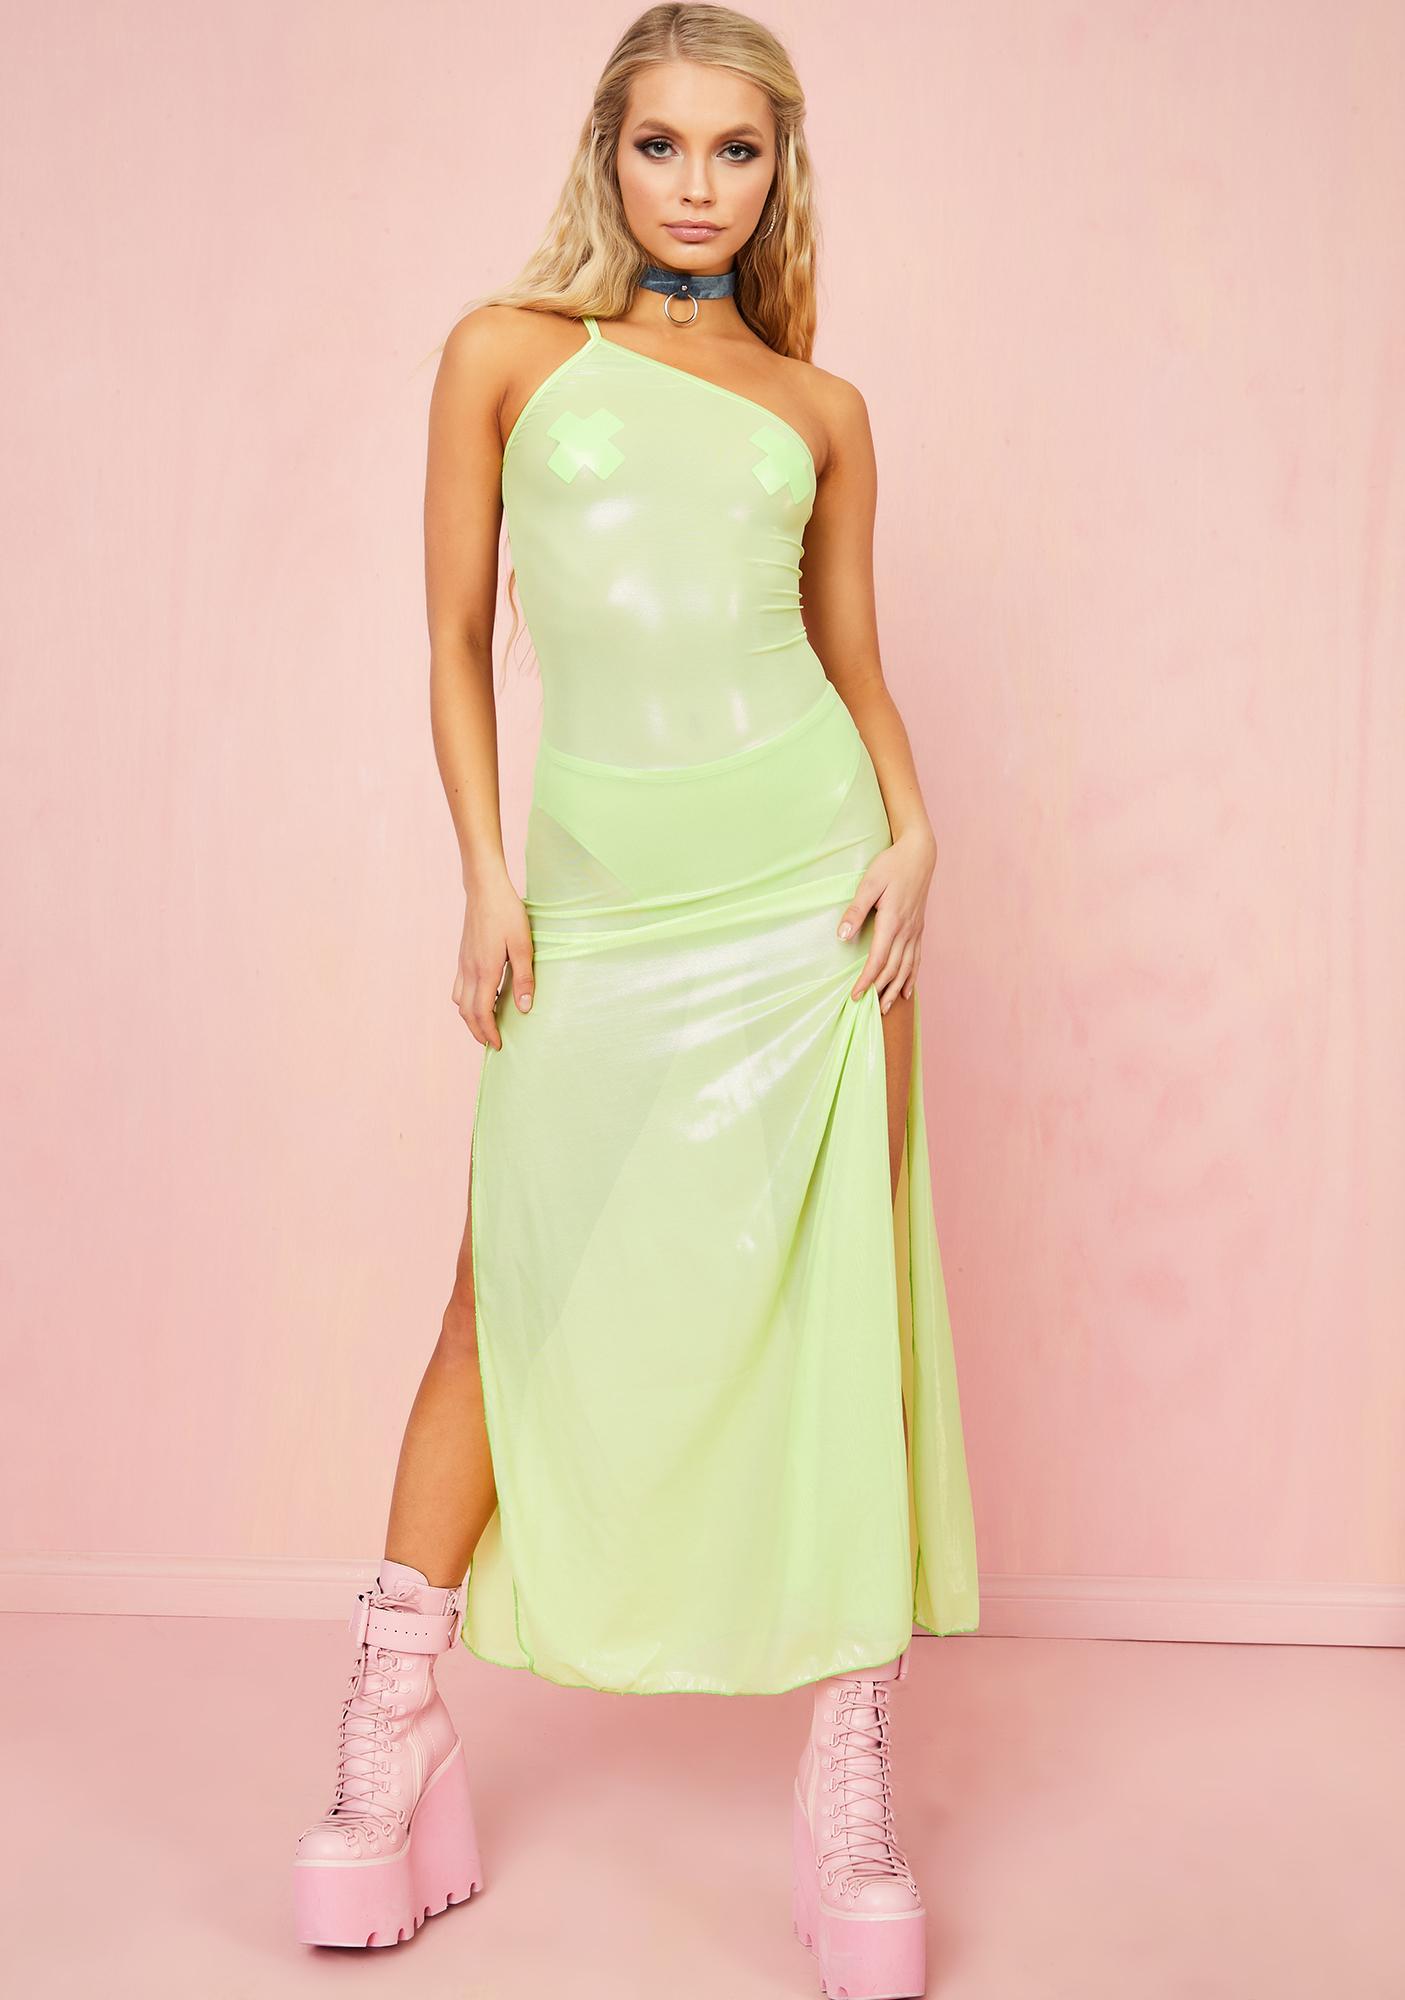 Sugar Thrillz Tropical Getaway Mesh Dress